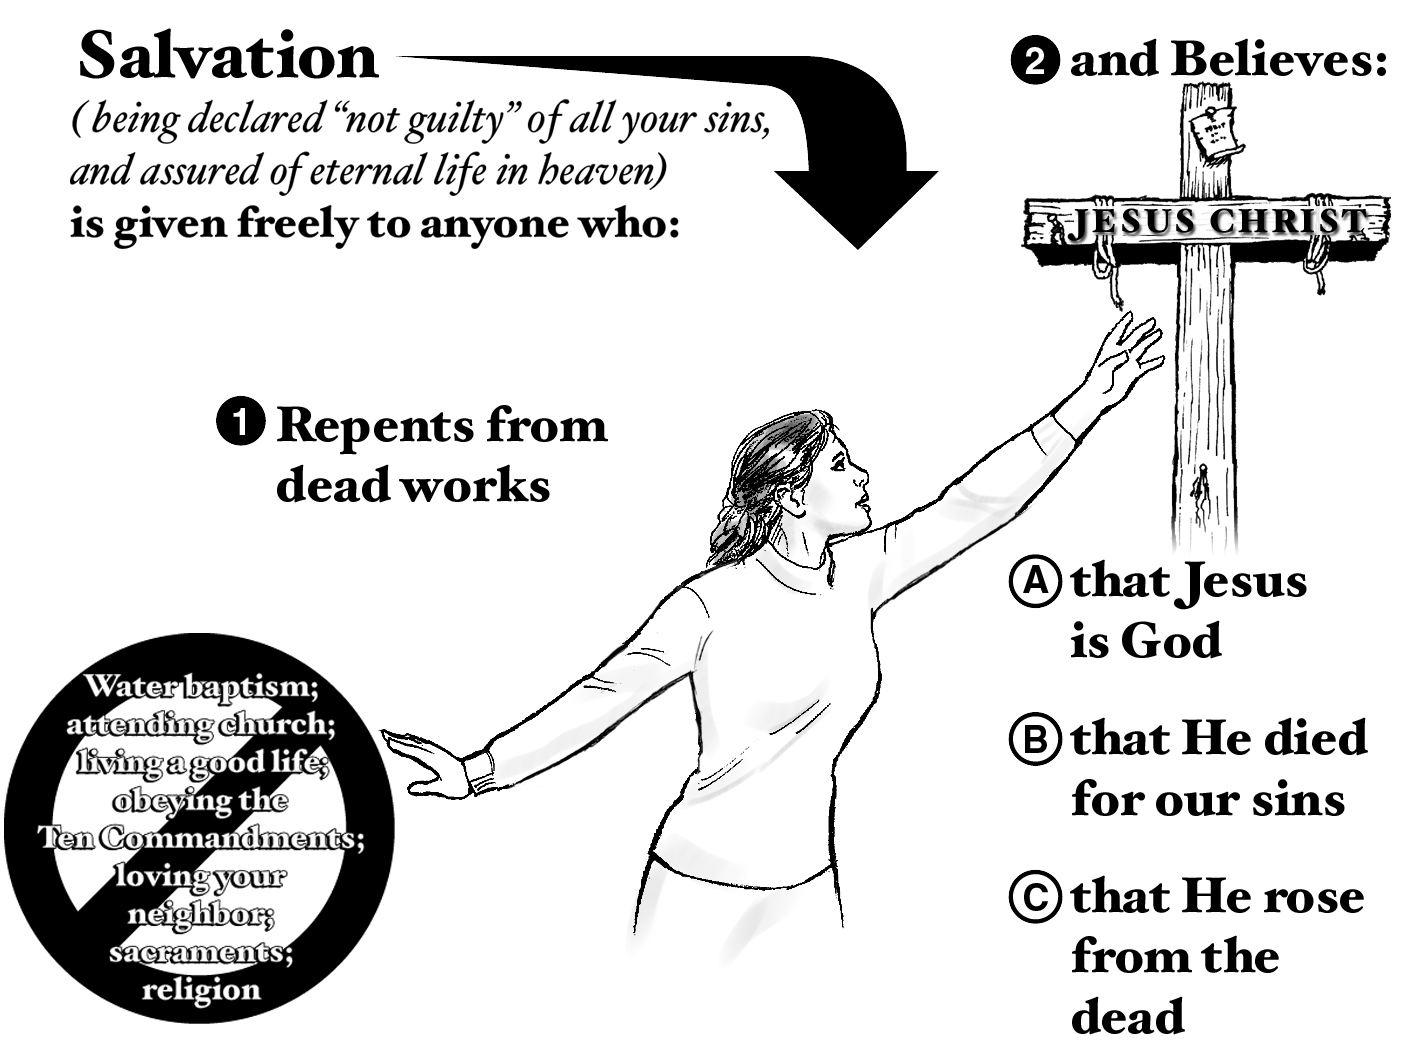 Gospel, p. 19_Summary_en